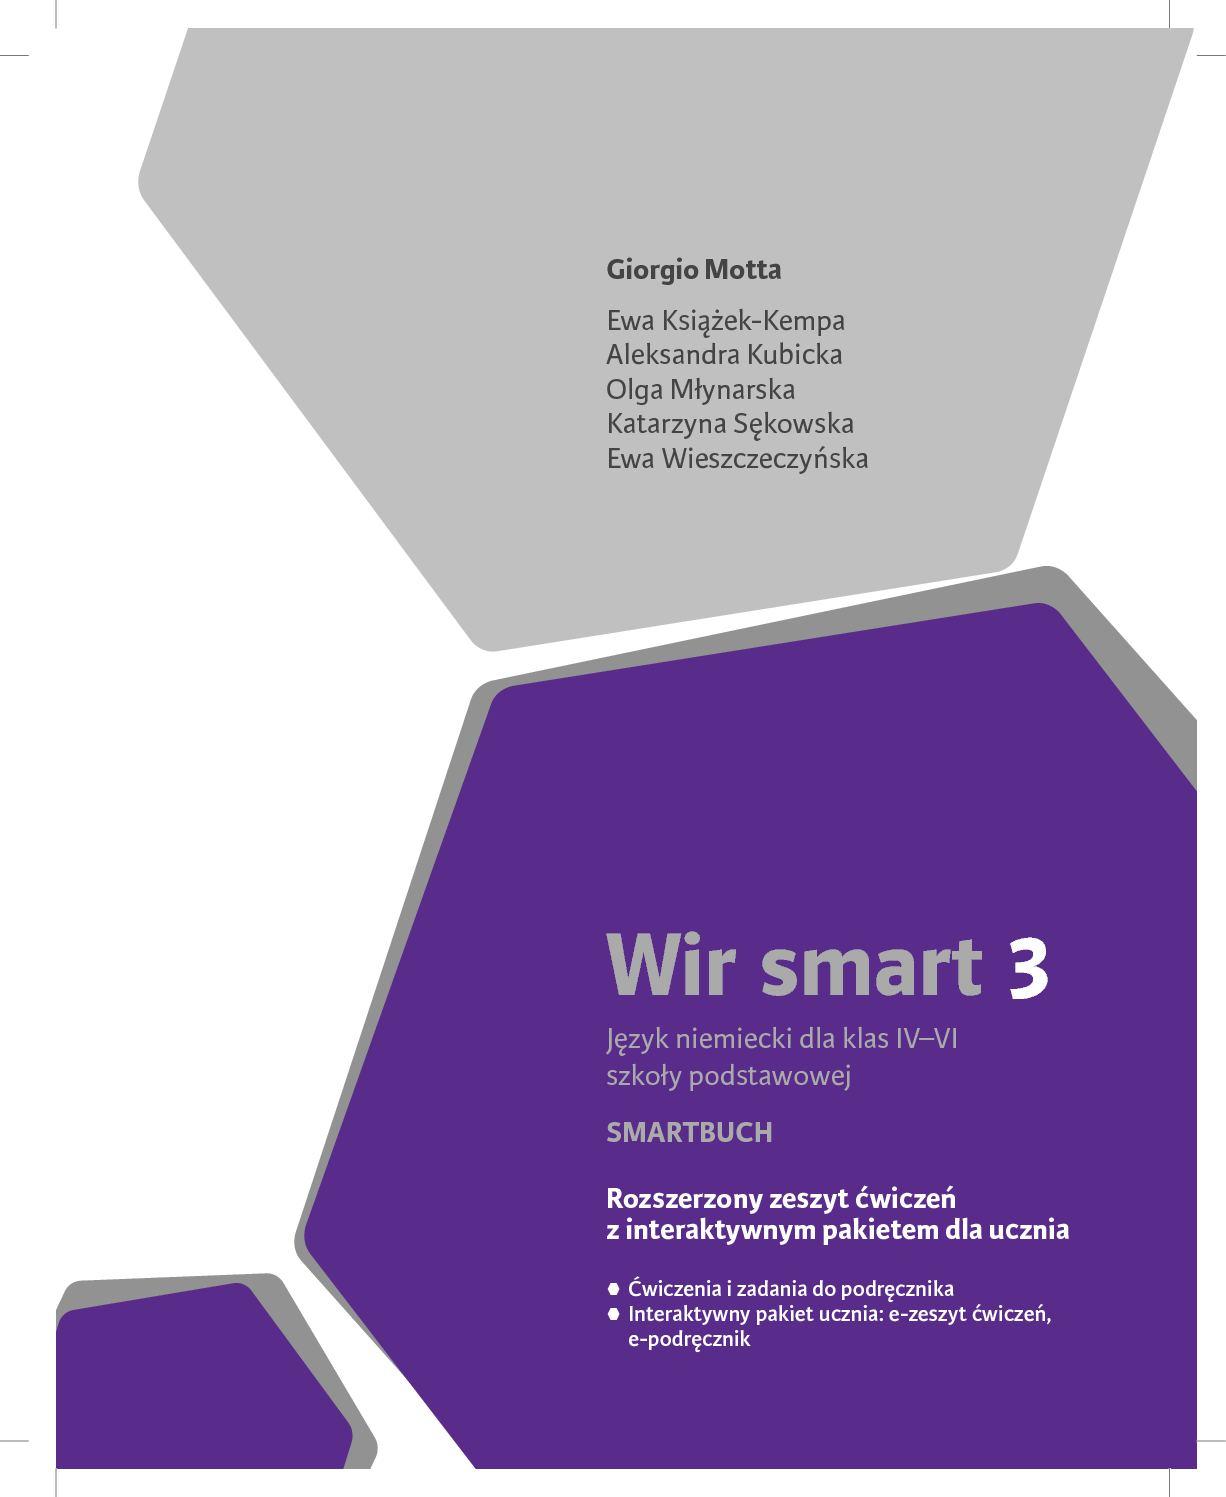 Wir Smart 3. Smartbuch